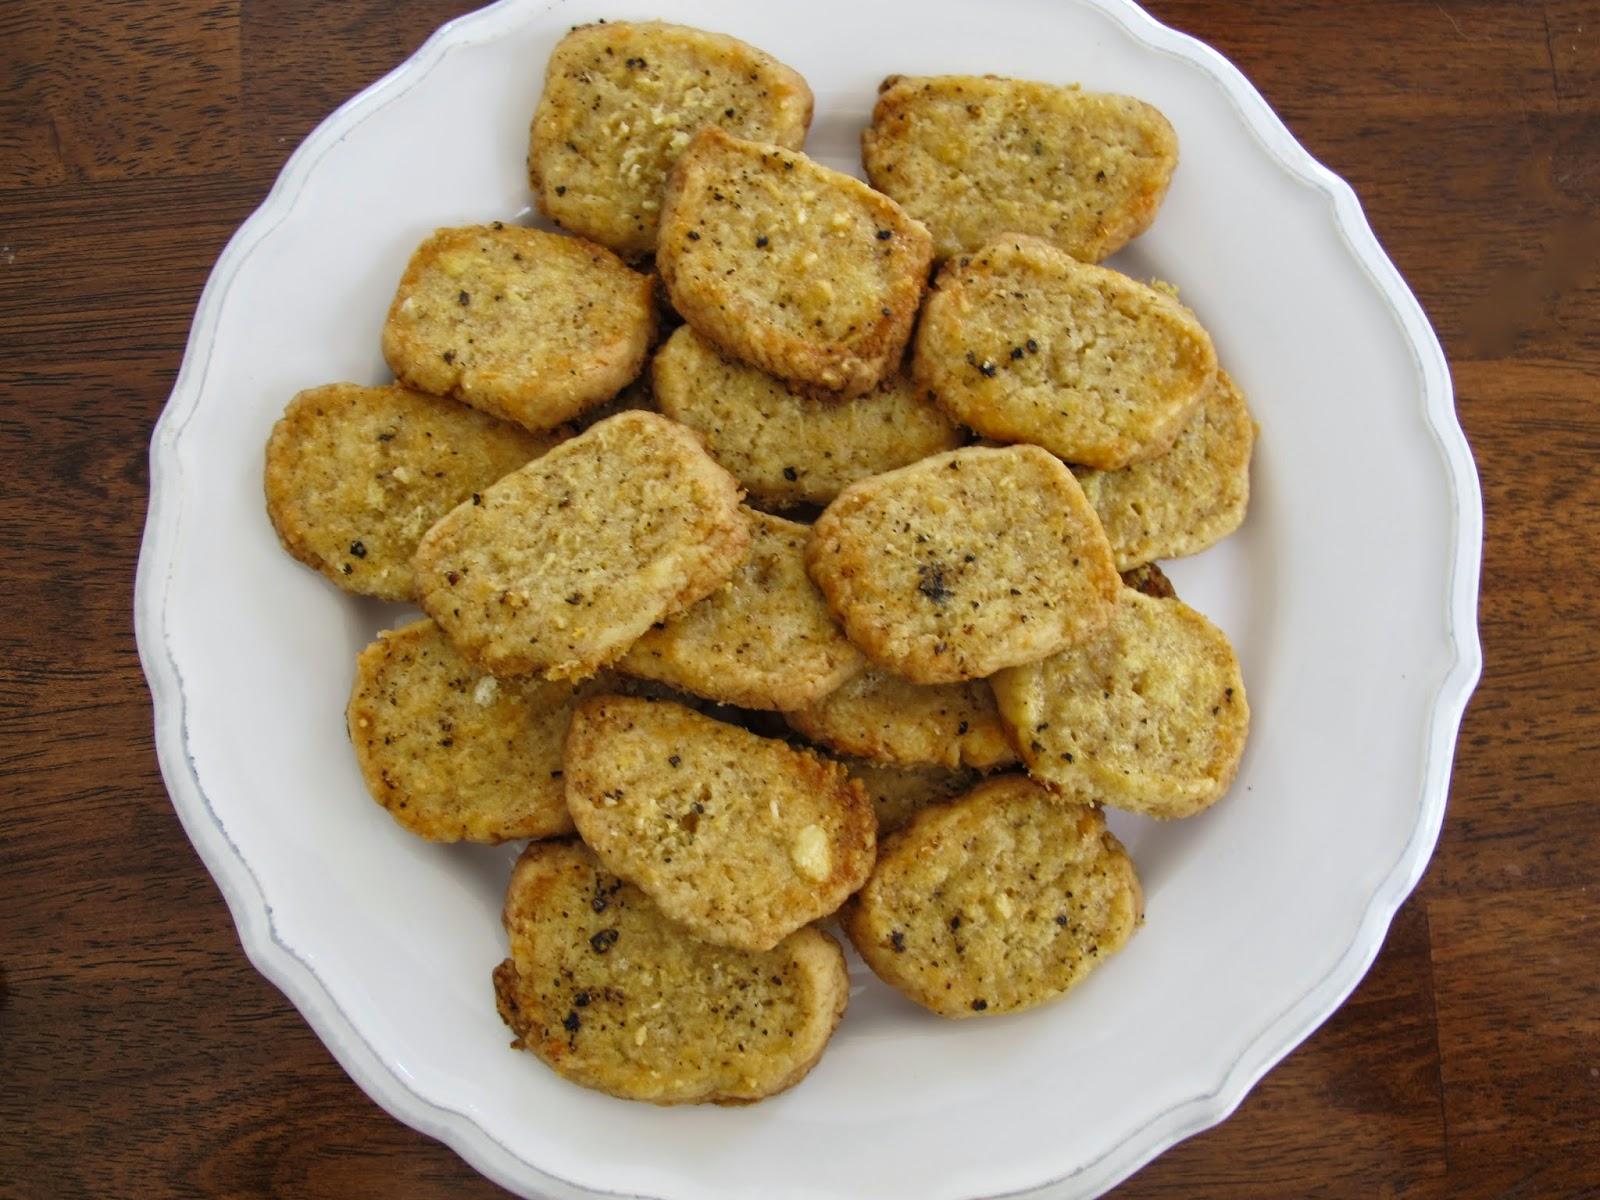 Parmesan Black Pepper Crackers